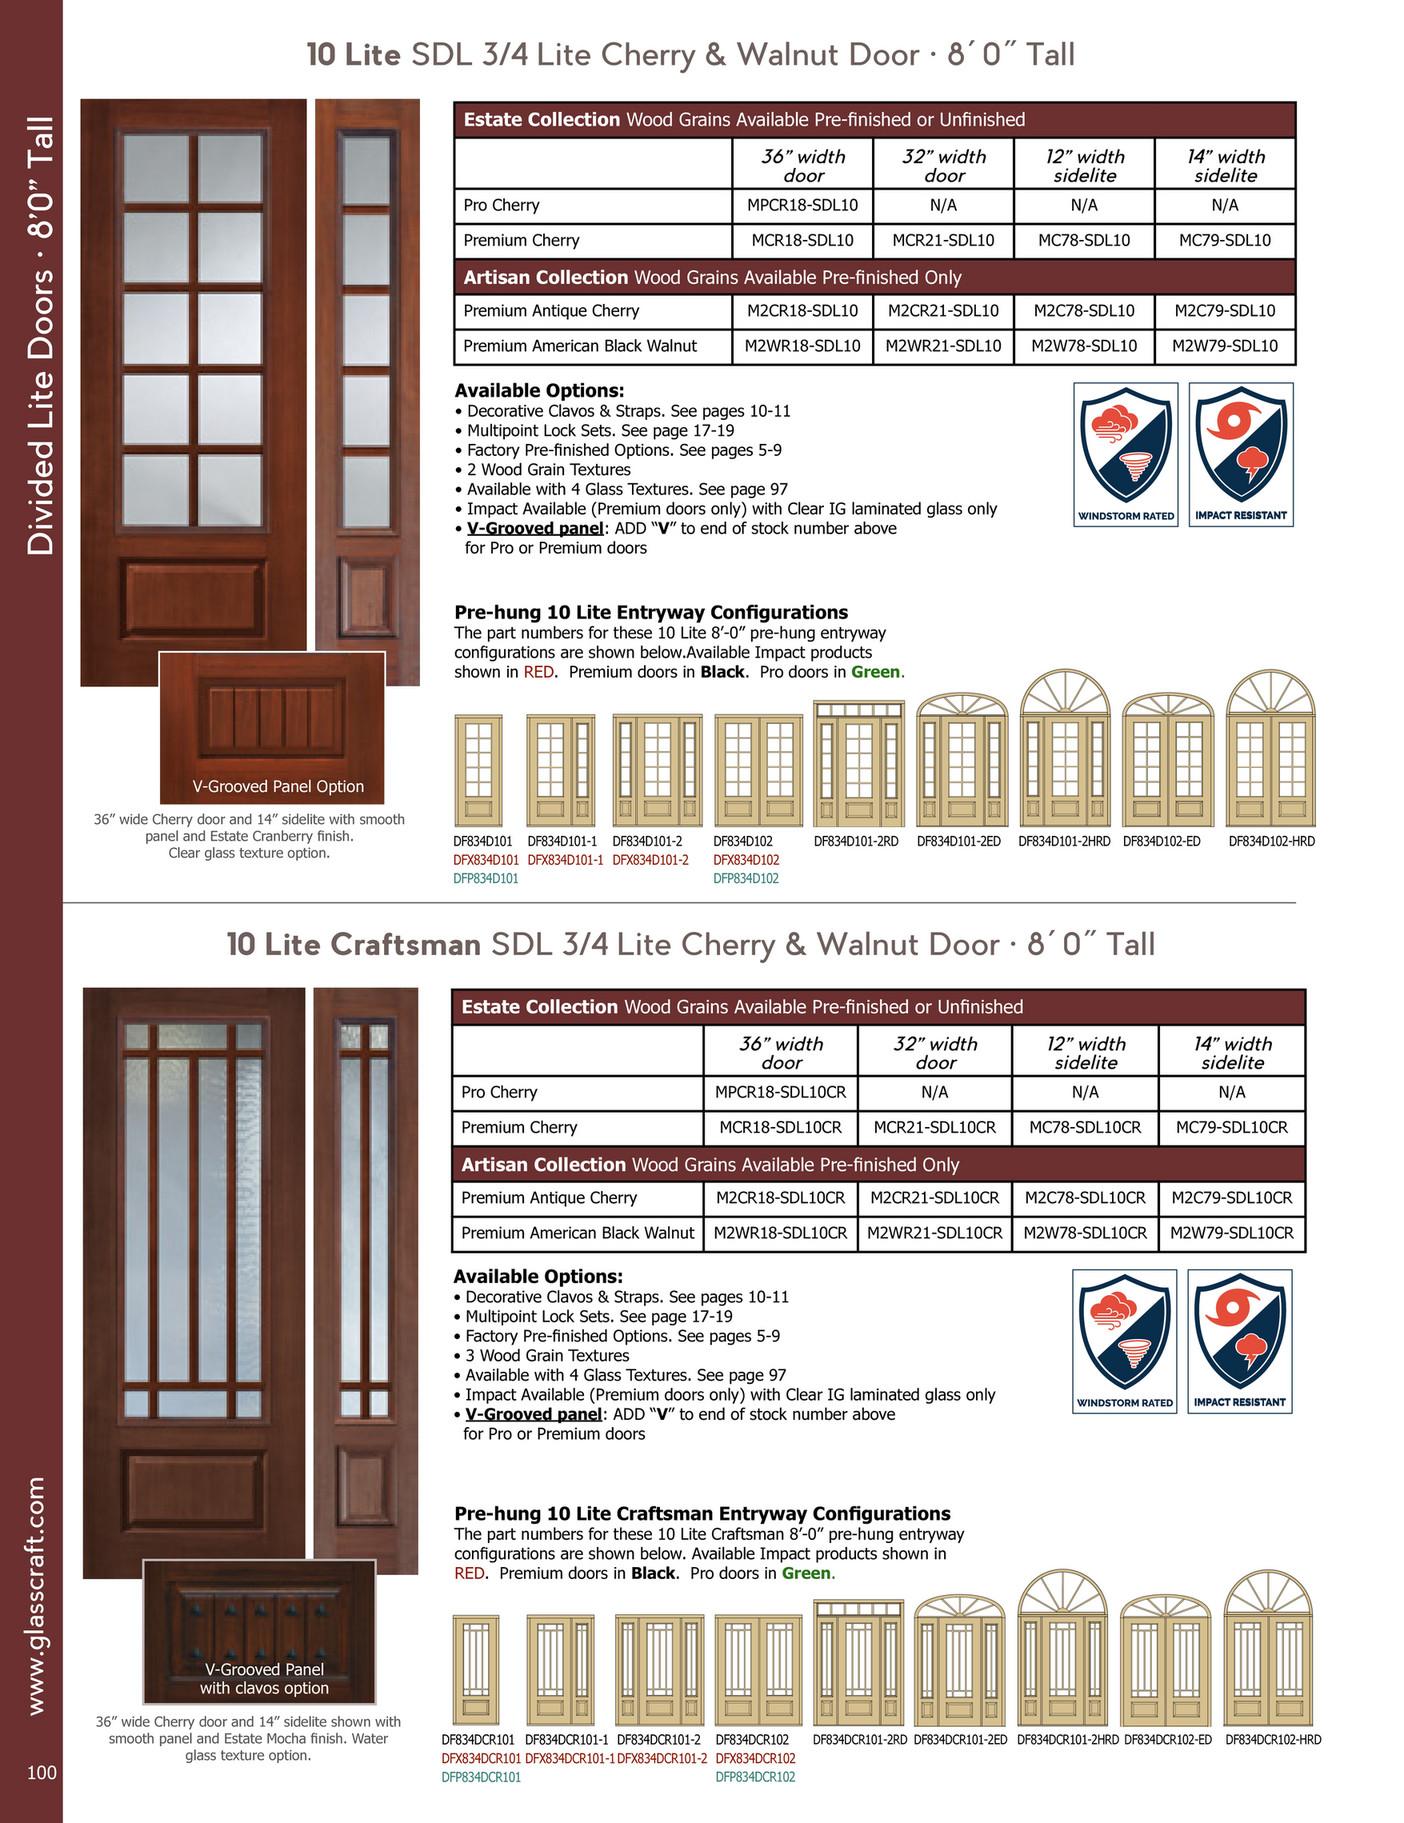 Glasscraft fiberglass catalog 2017 page 100 101 created with 4 lite sdl 23 lite knotty alder door 8 0 tall eventelaan Gallery